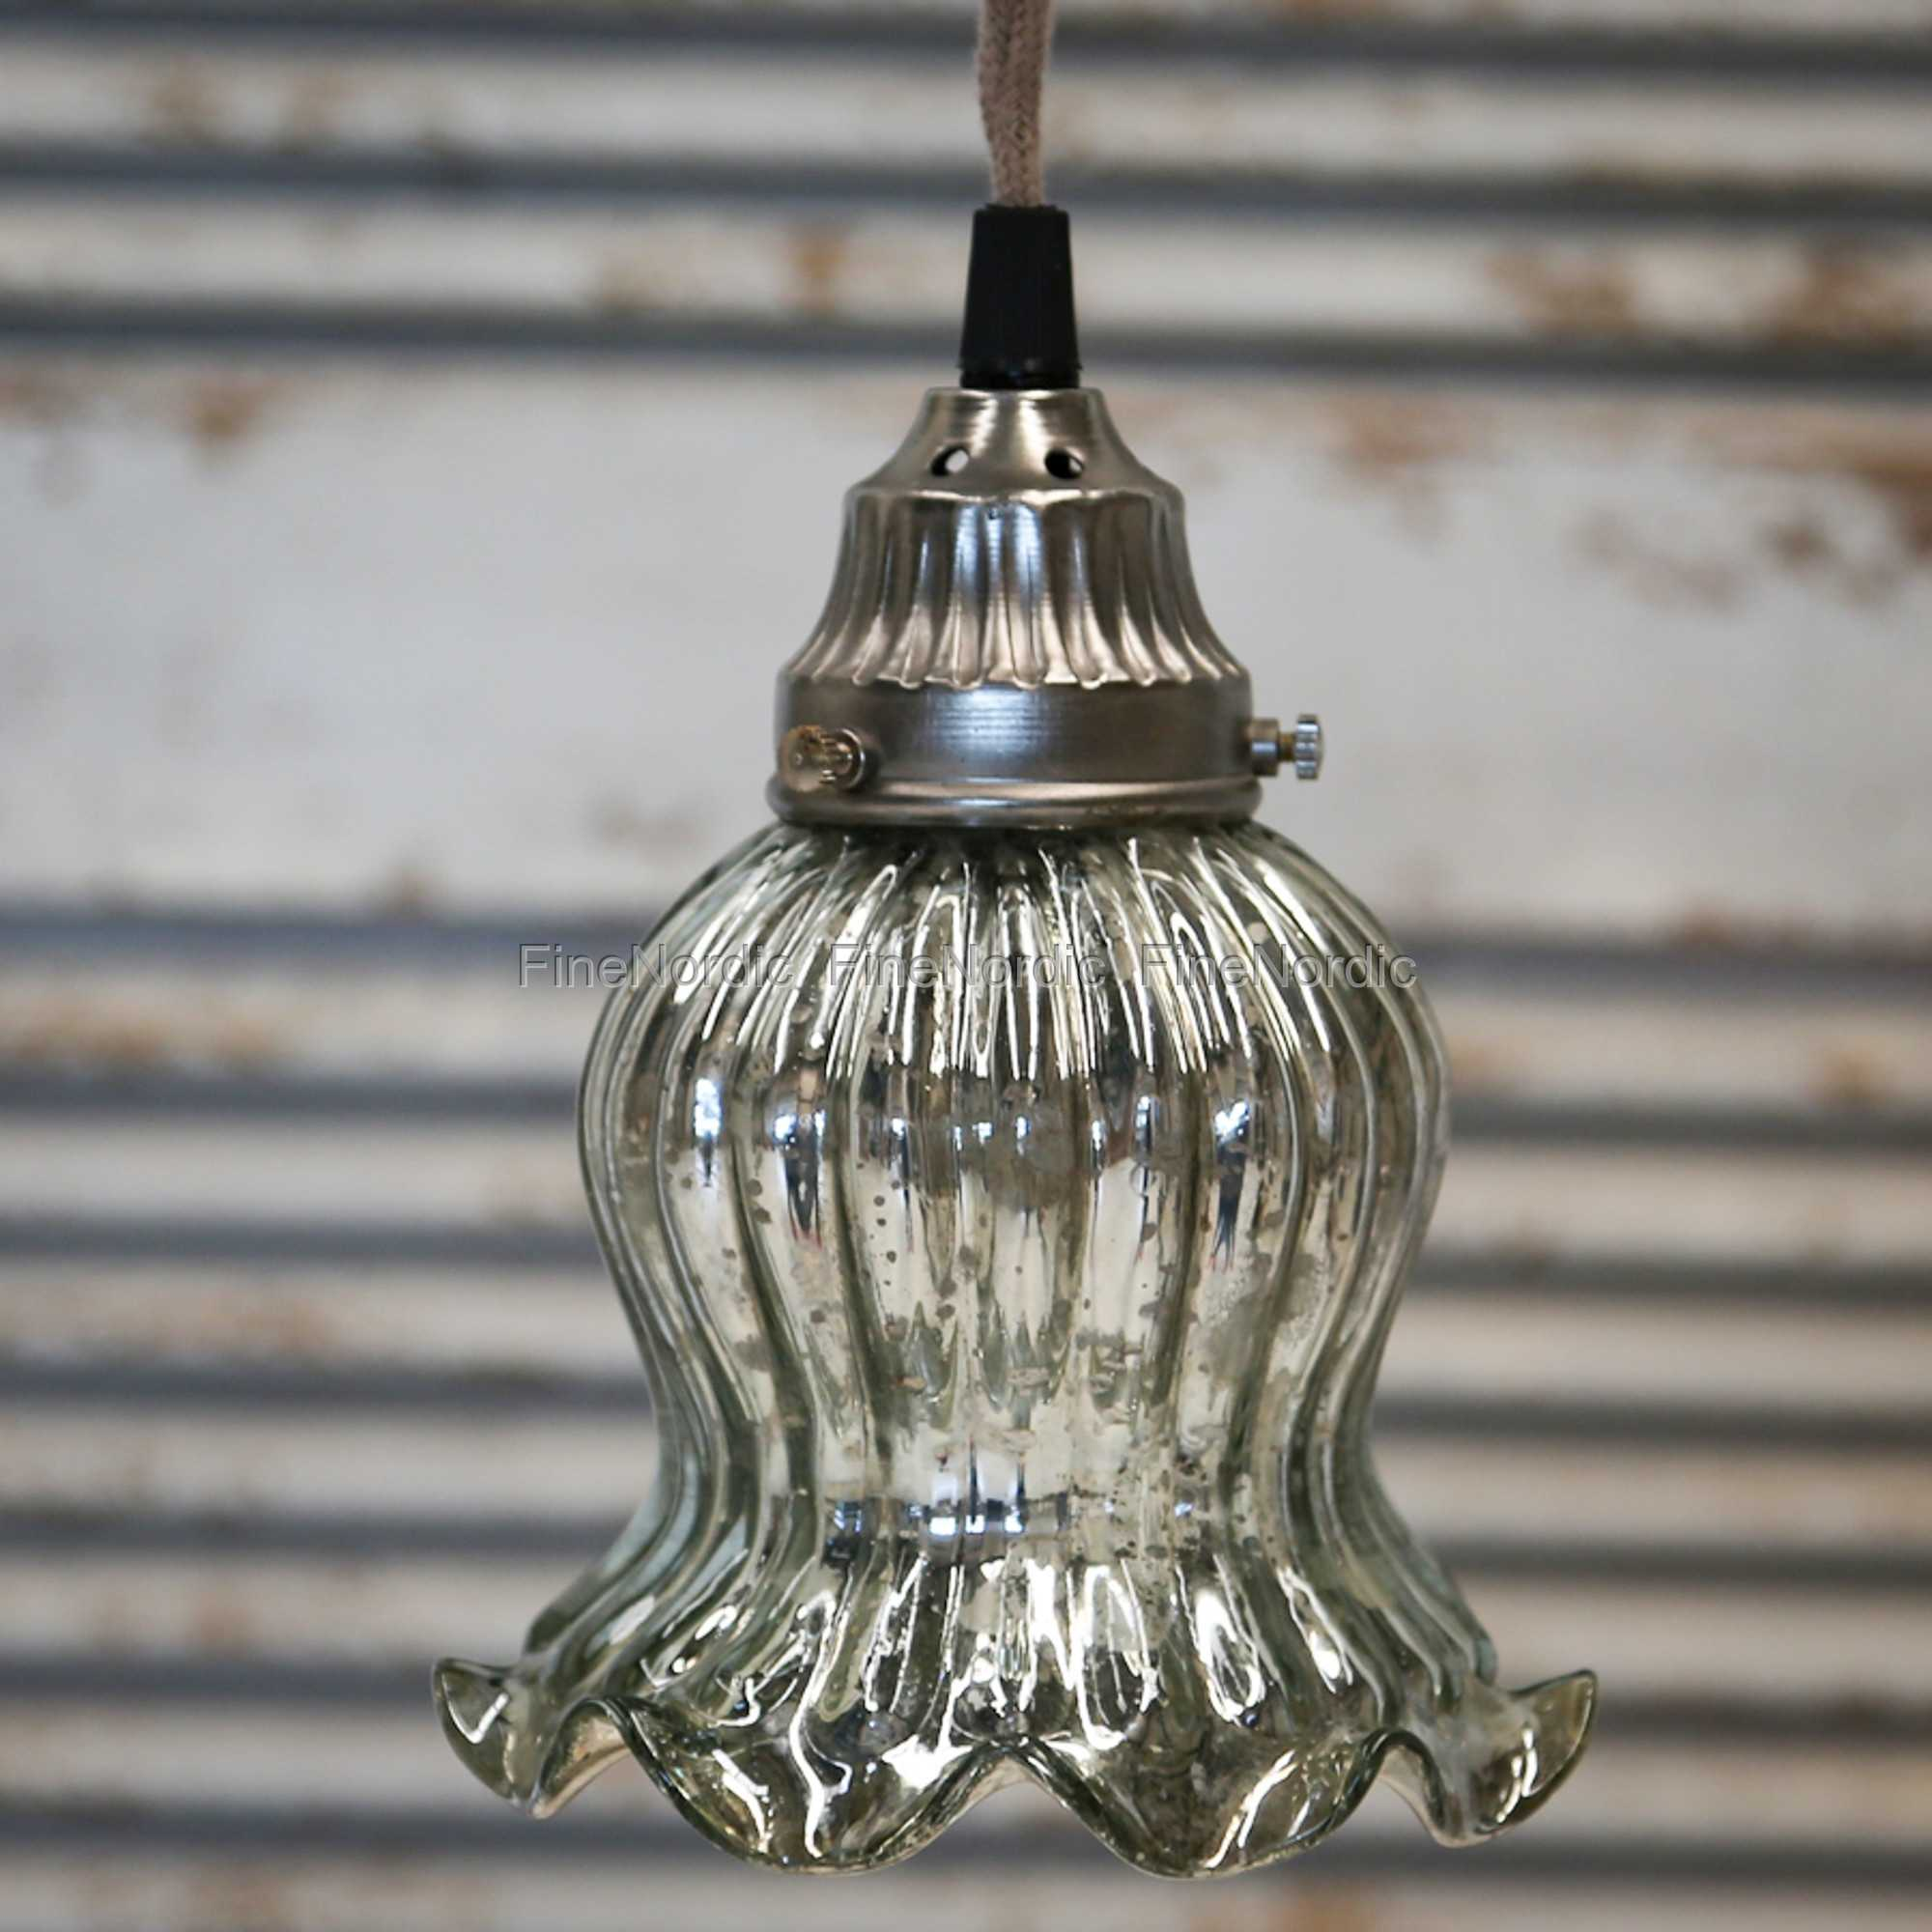 Chic Antique Lampe med Perlekant Glas Handgjort